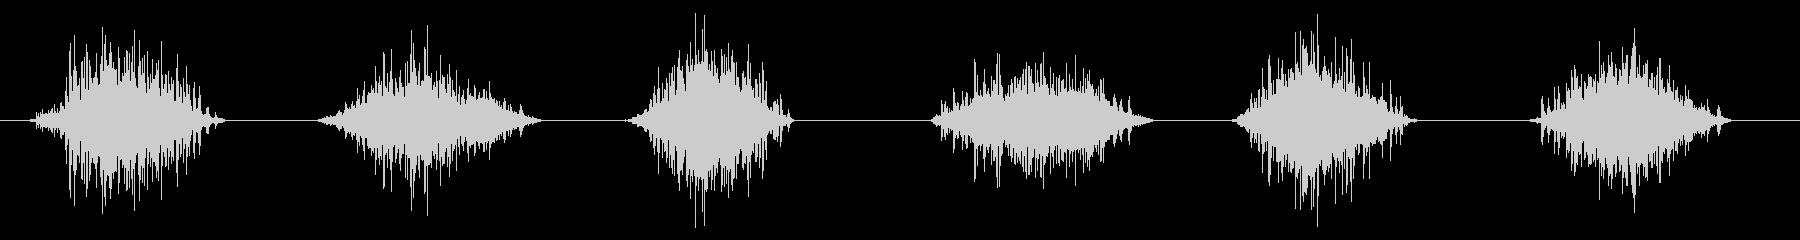 PC マウス ムーブ02-02(ハード)の未再生の波形